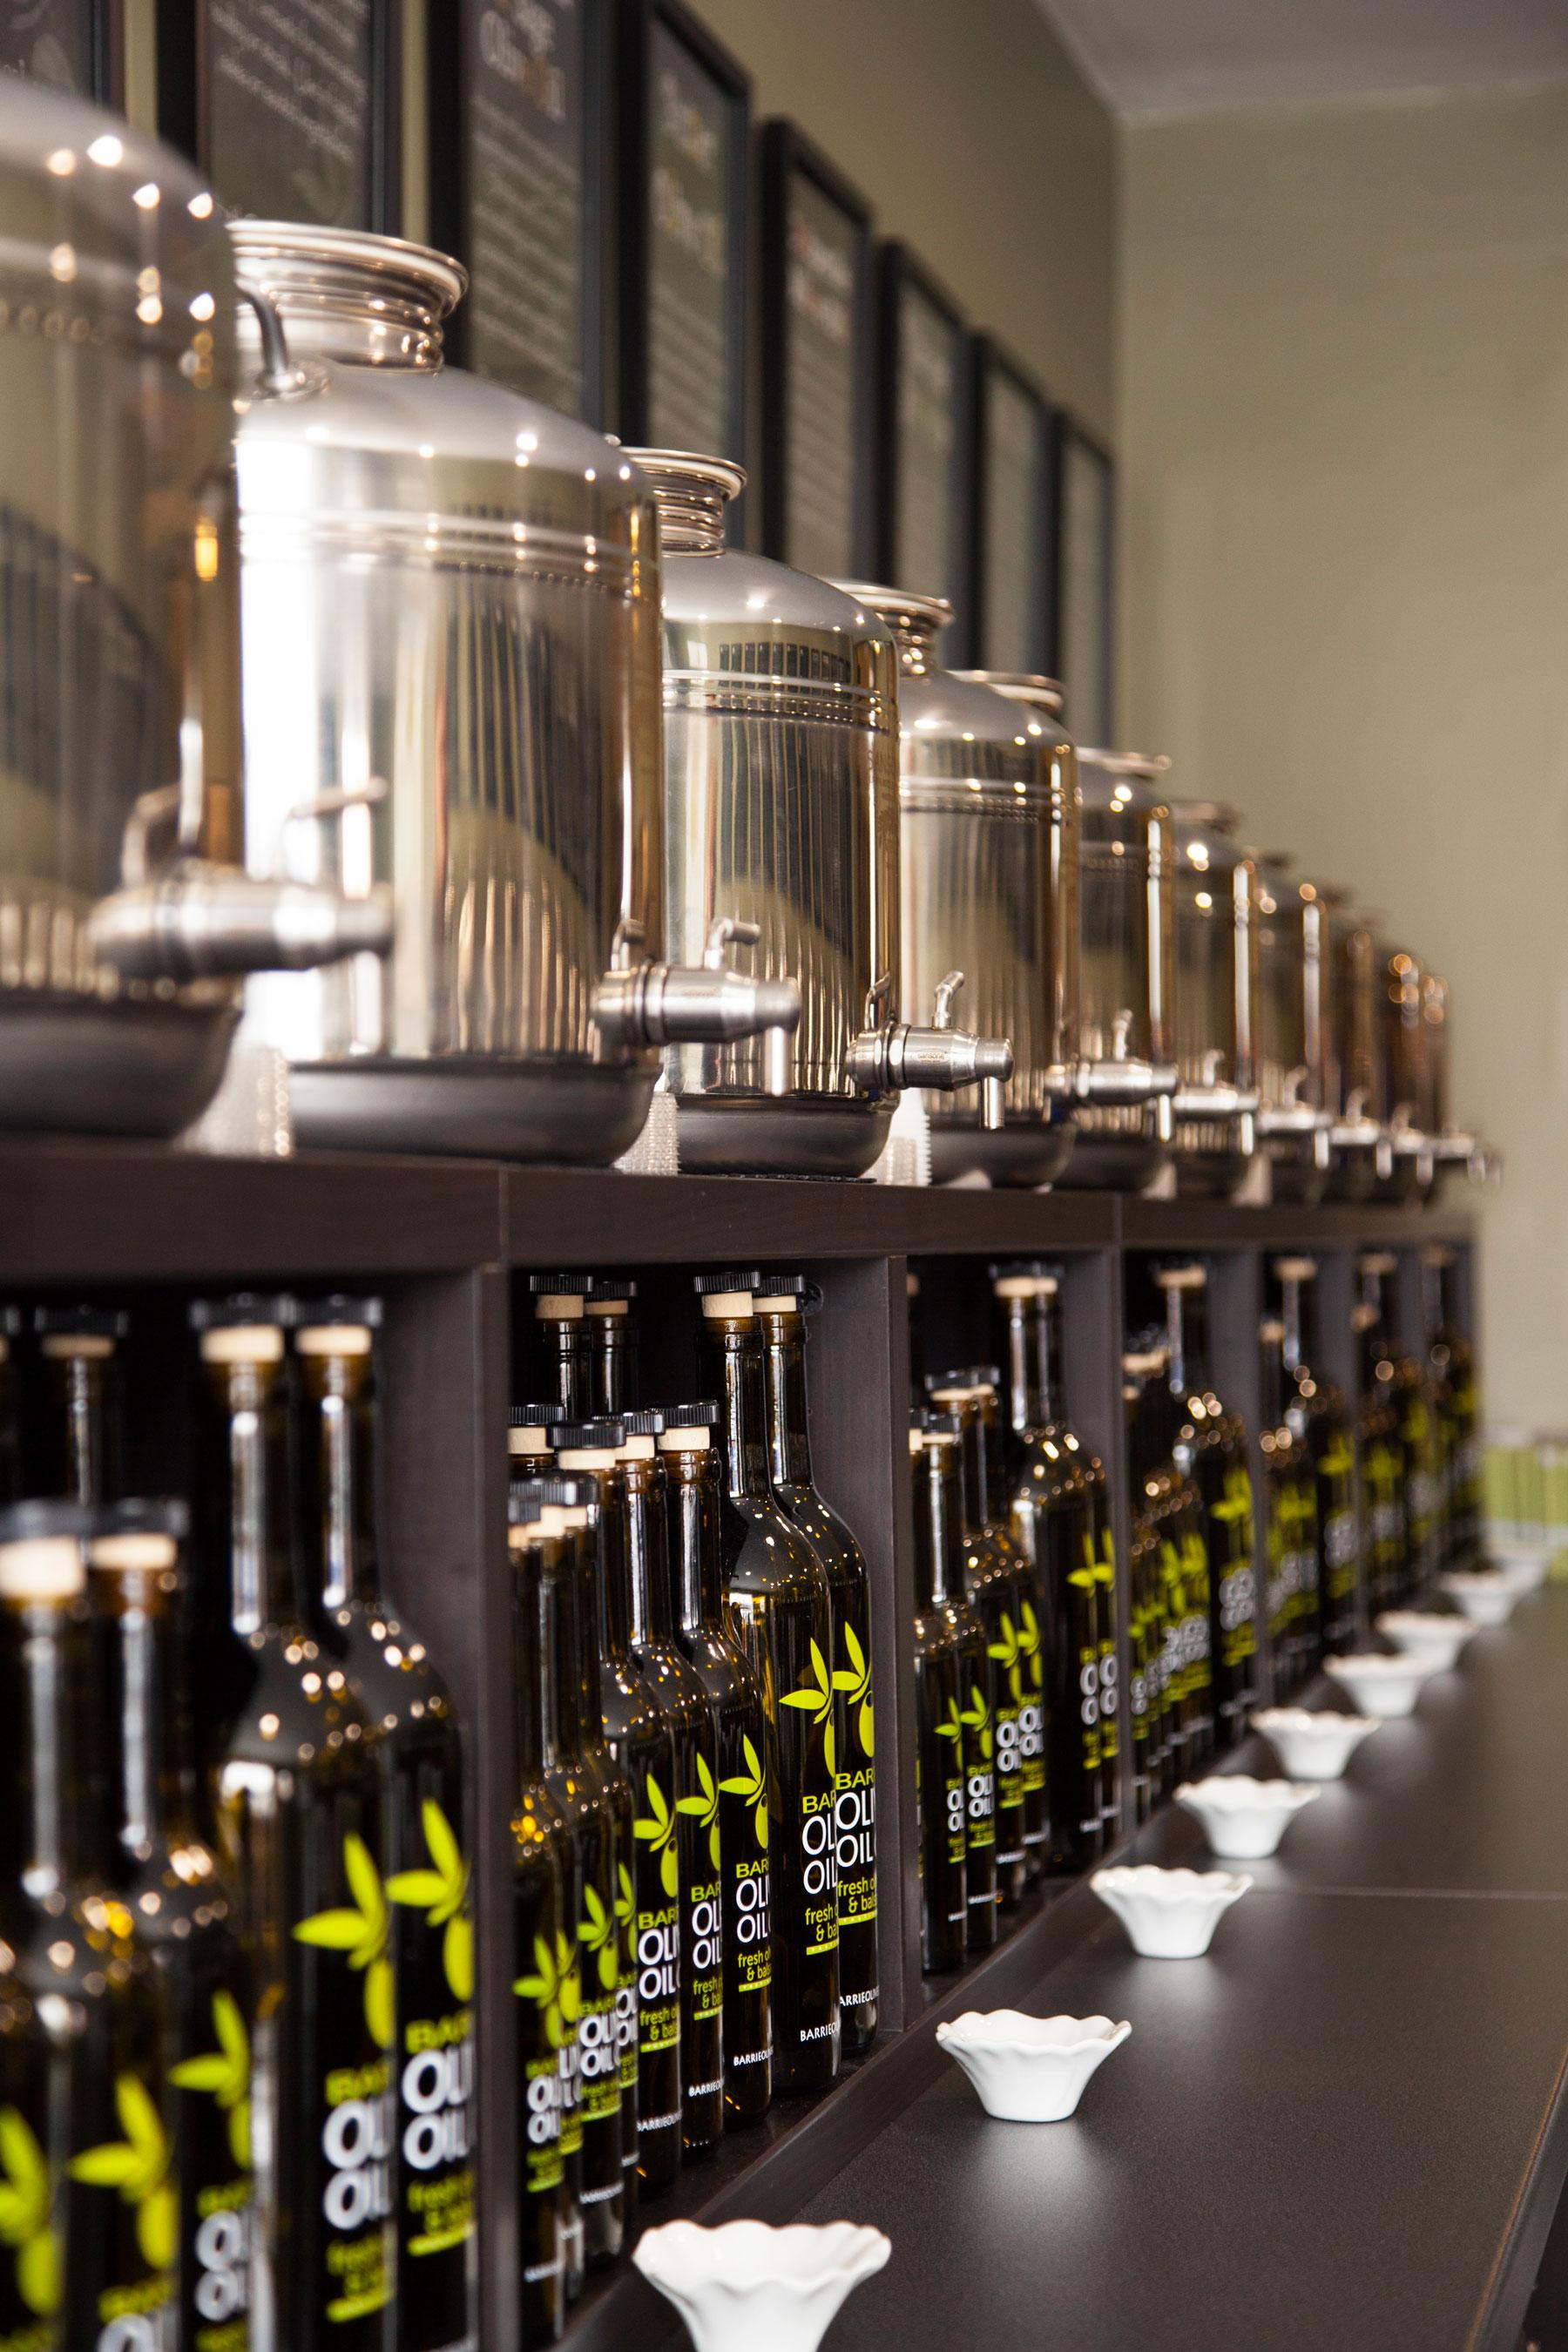 Olive Oil Co.